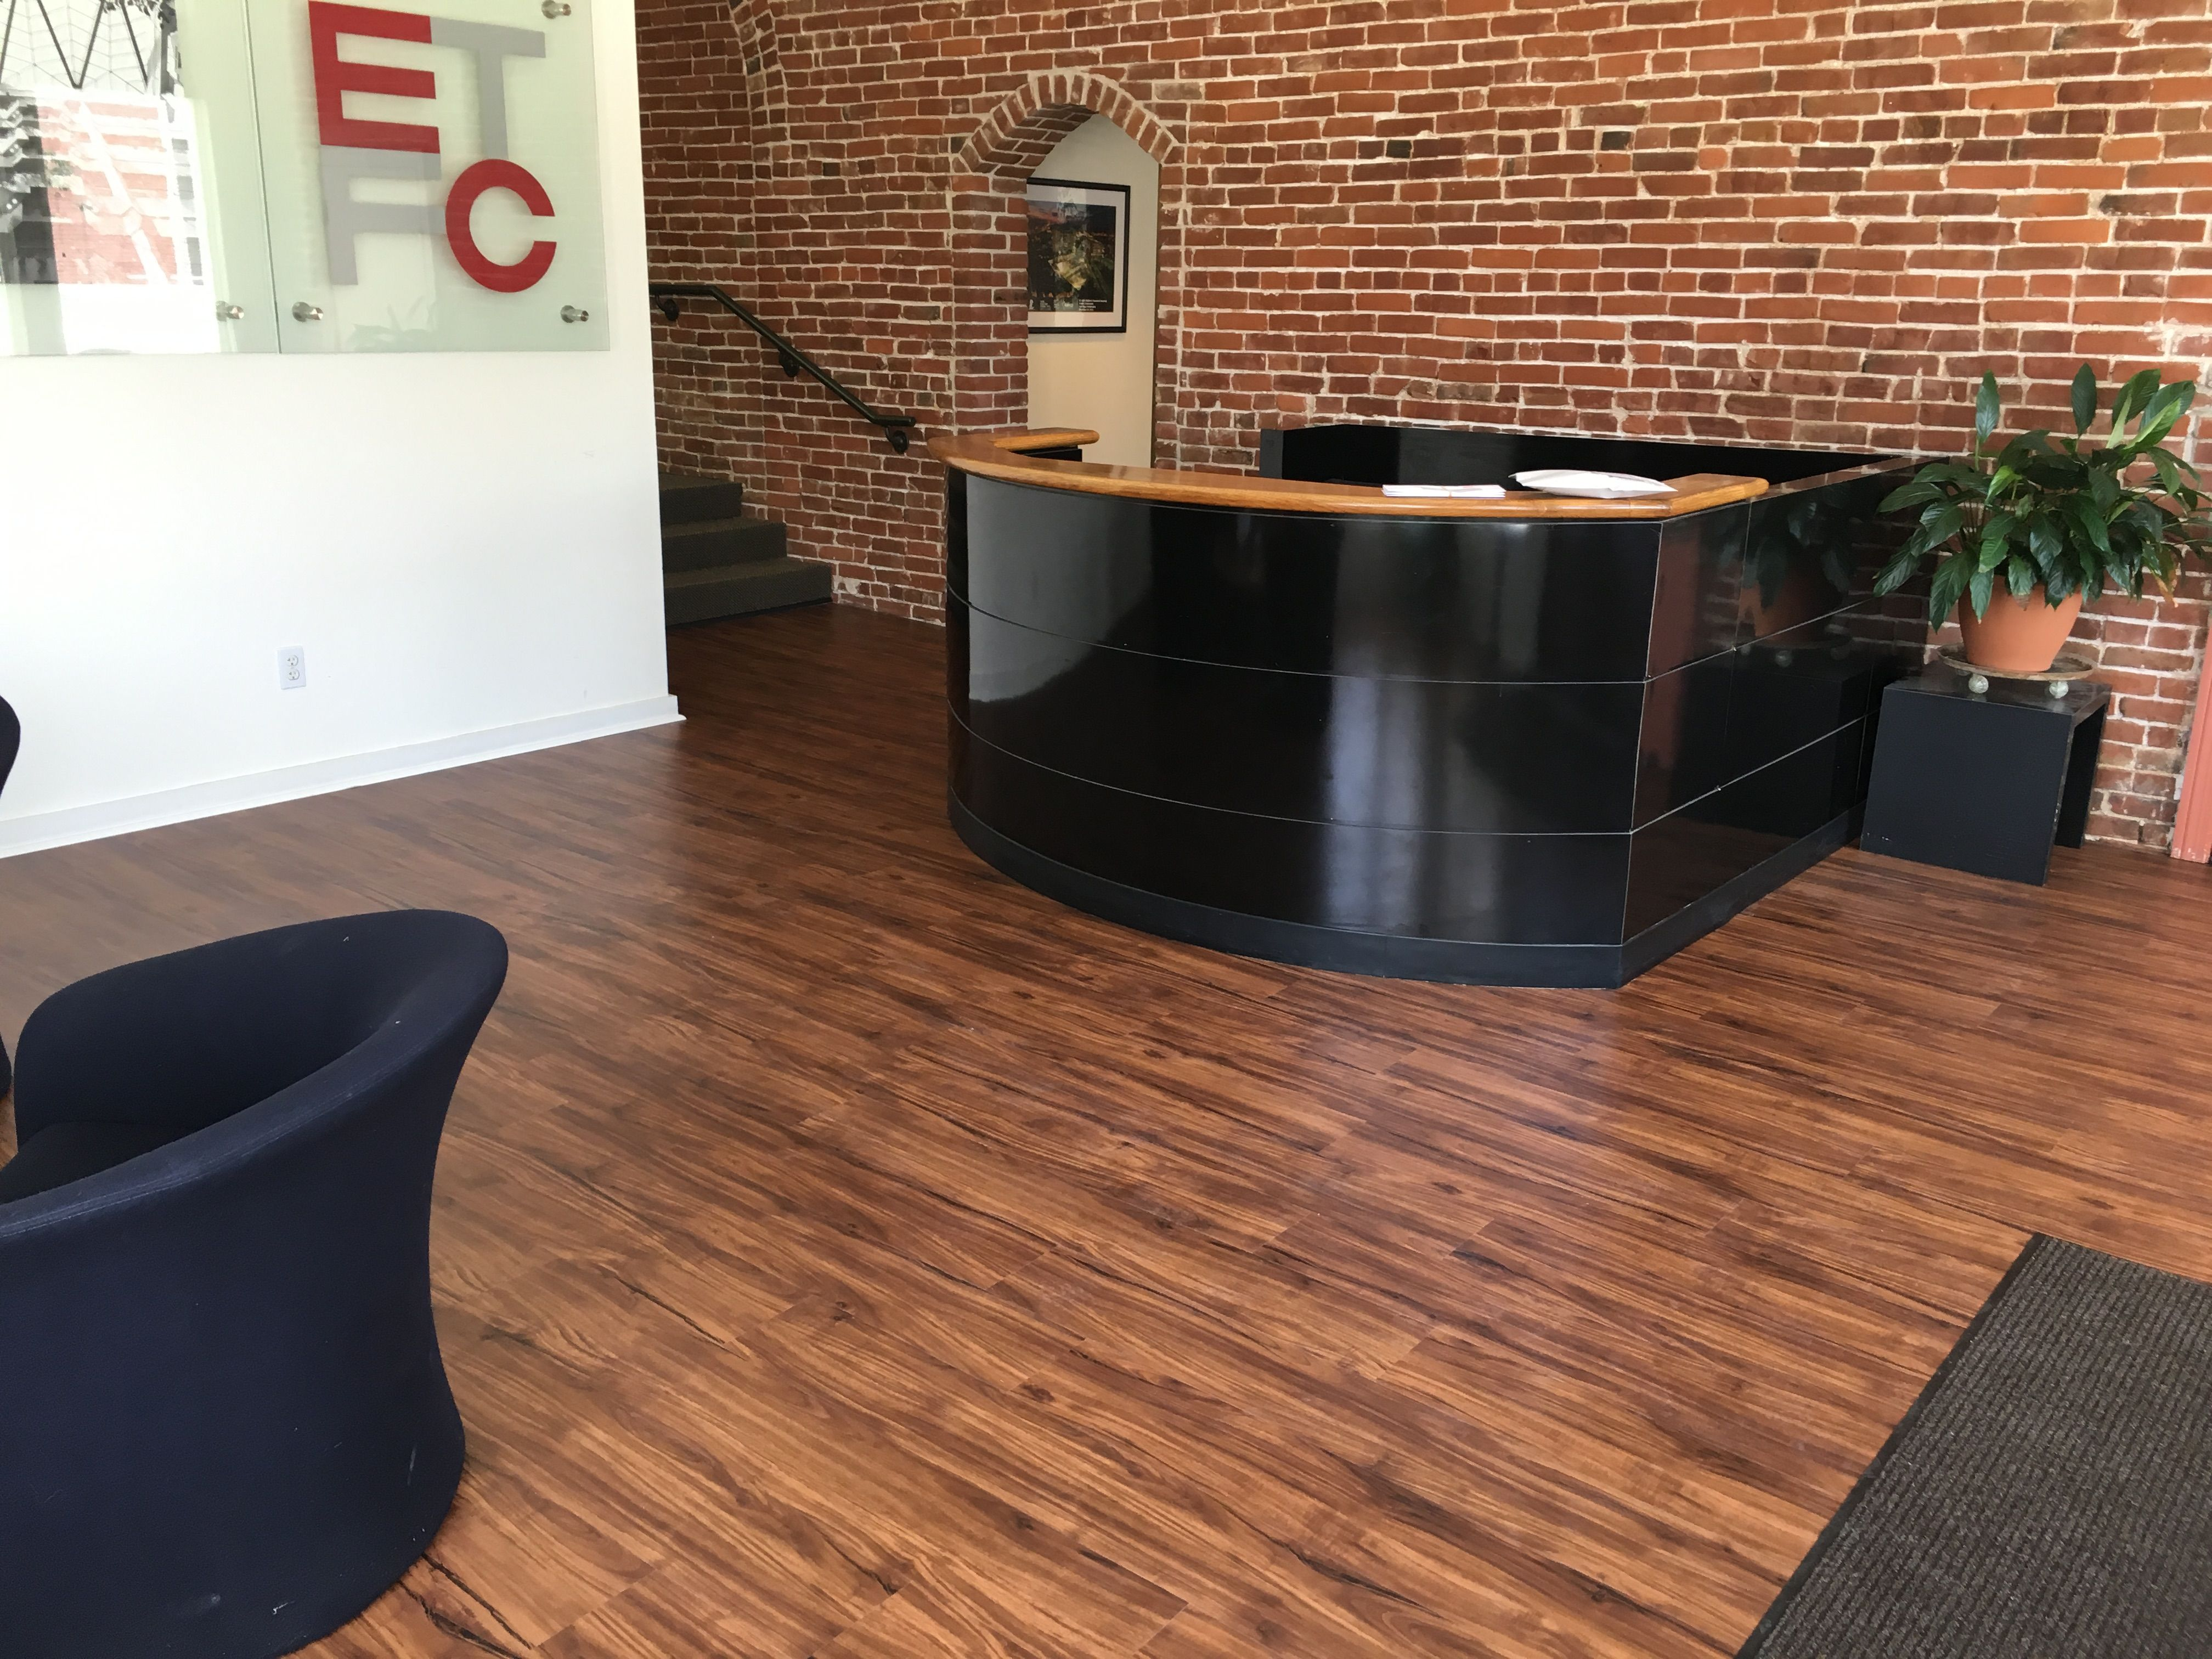 Prestige Options Lvt In Color Acacia Item Pres879cl Etfc Architects In Downtown Memphis Tn Installed Bpi S Prestige Lvt In T Flooring Interior Design Design